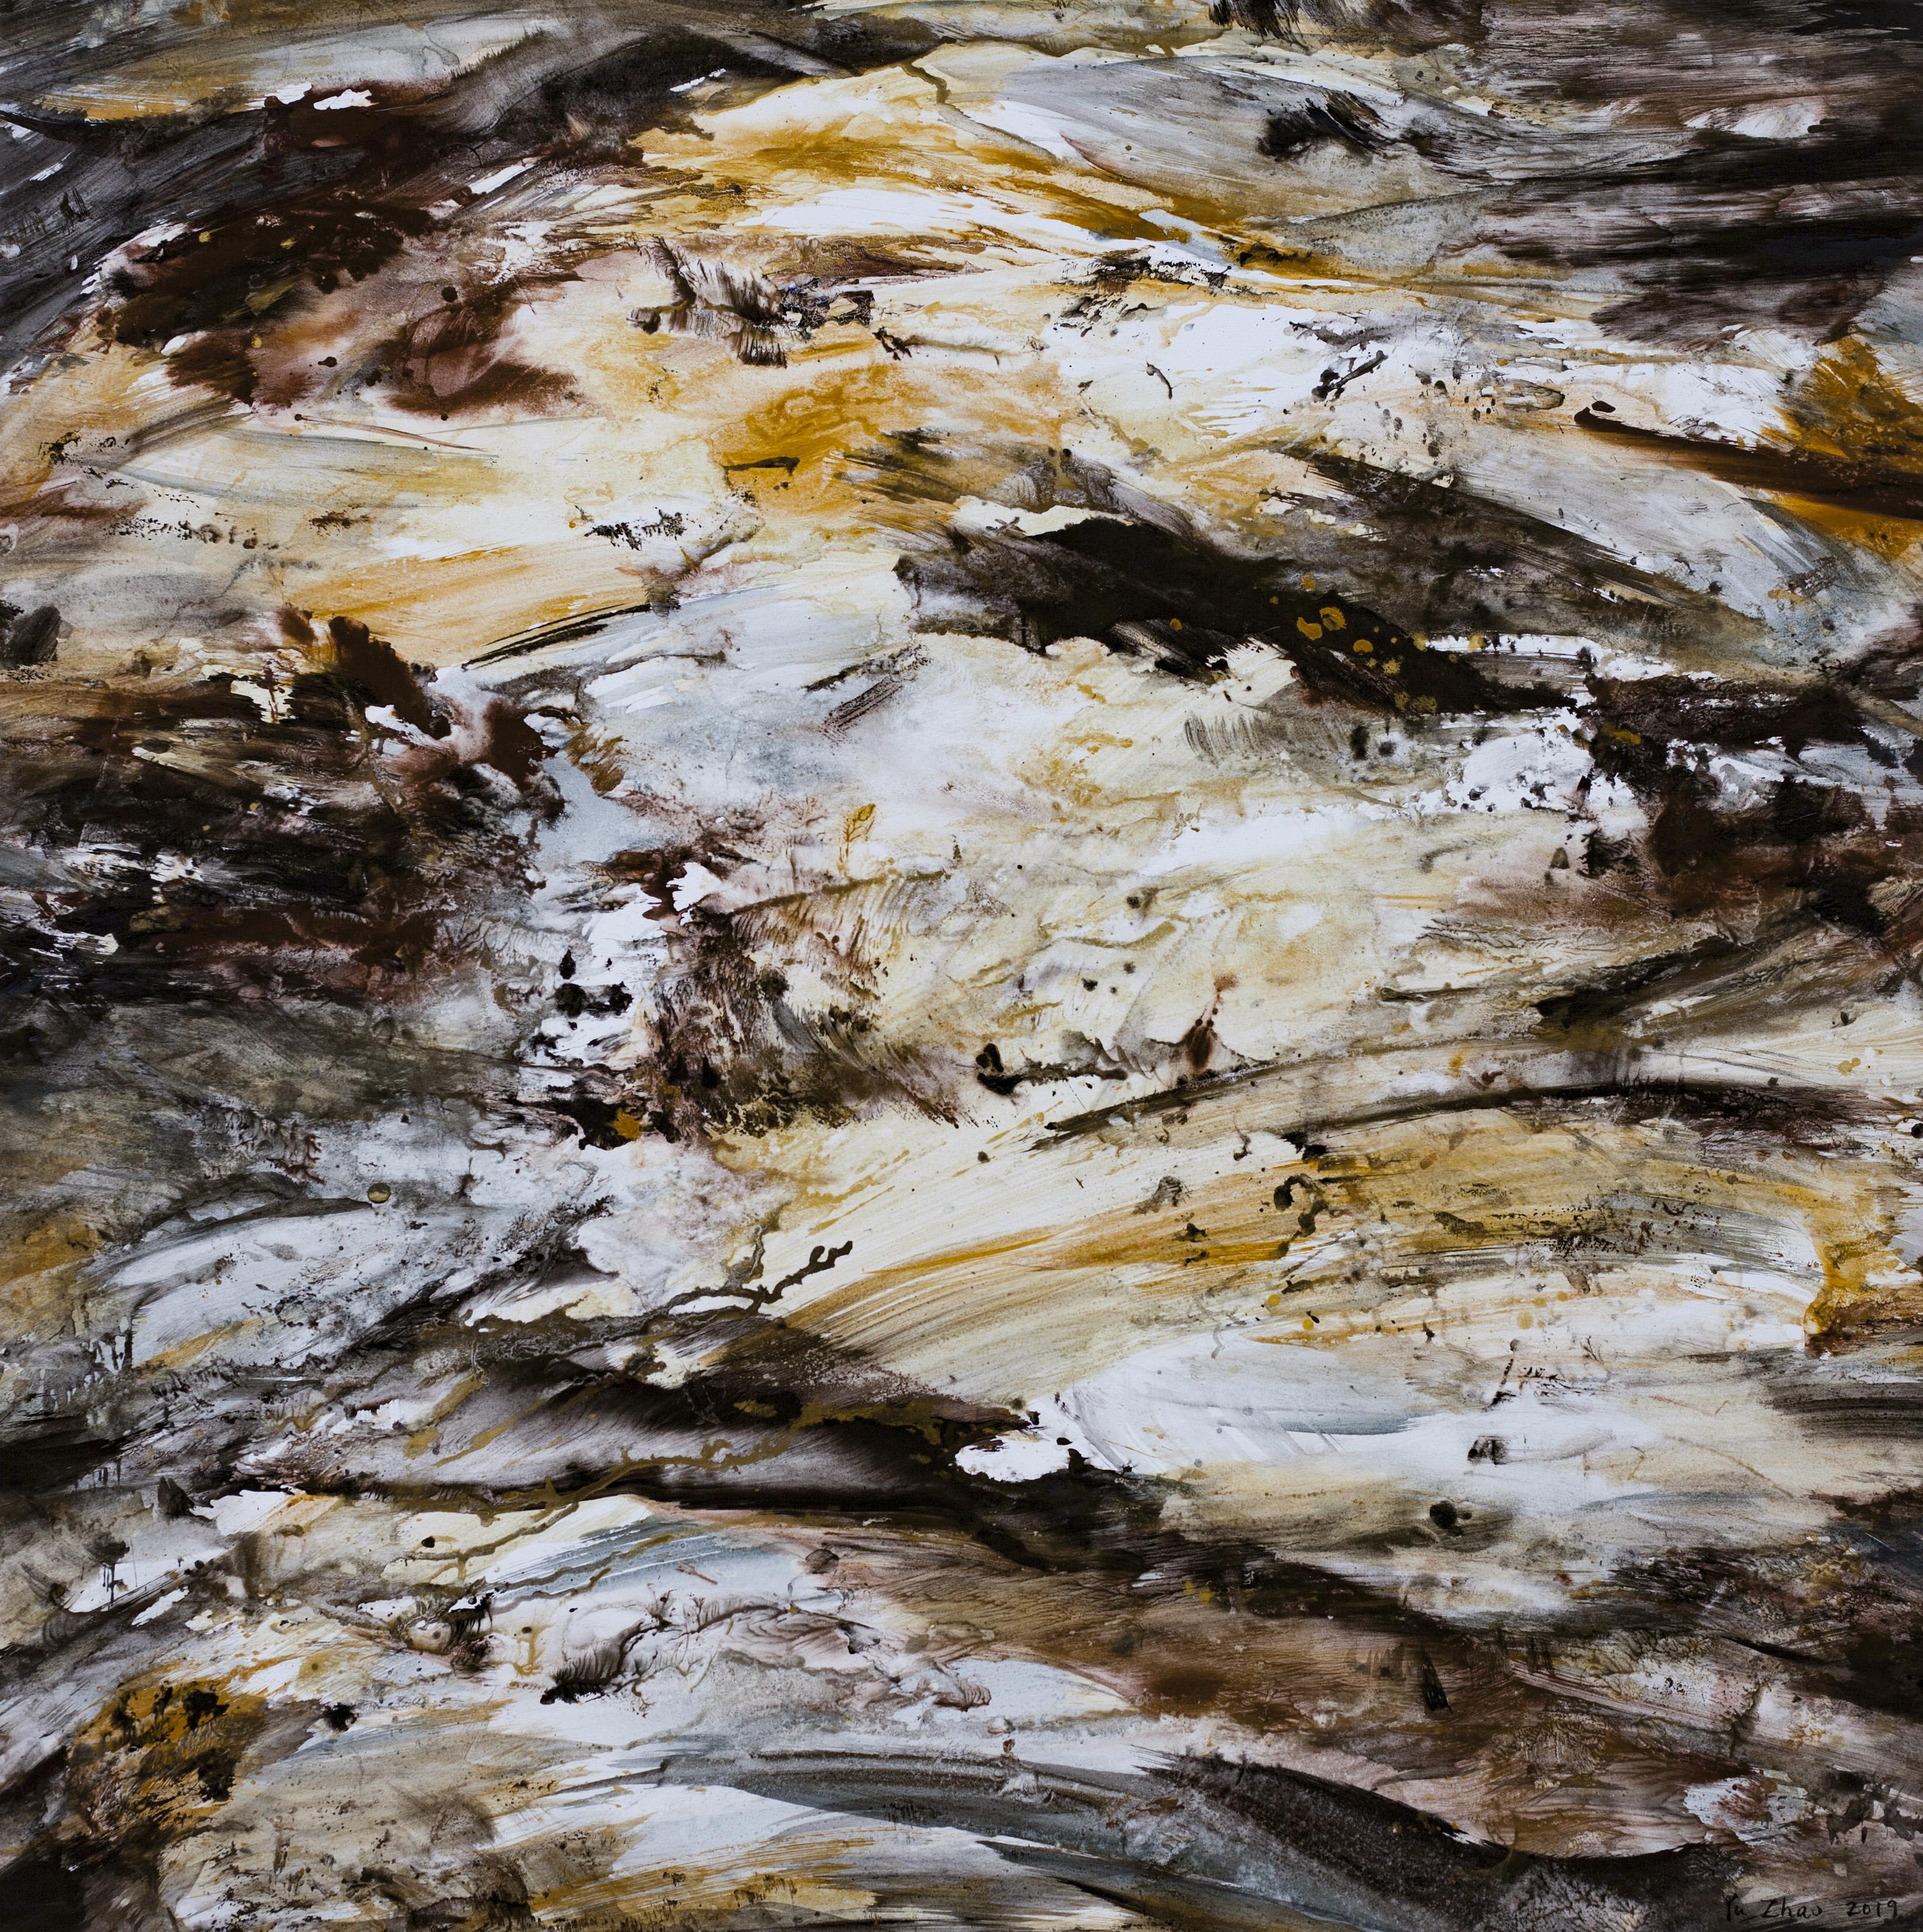 Terre renaissante, tempera/paper/canvas, 100x100cm, 2019, Yu Zhao